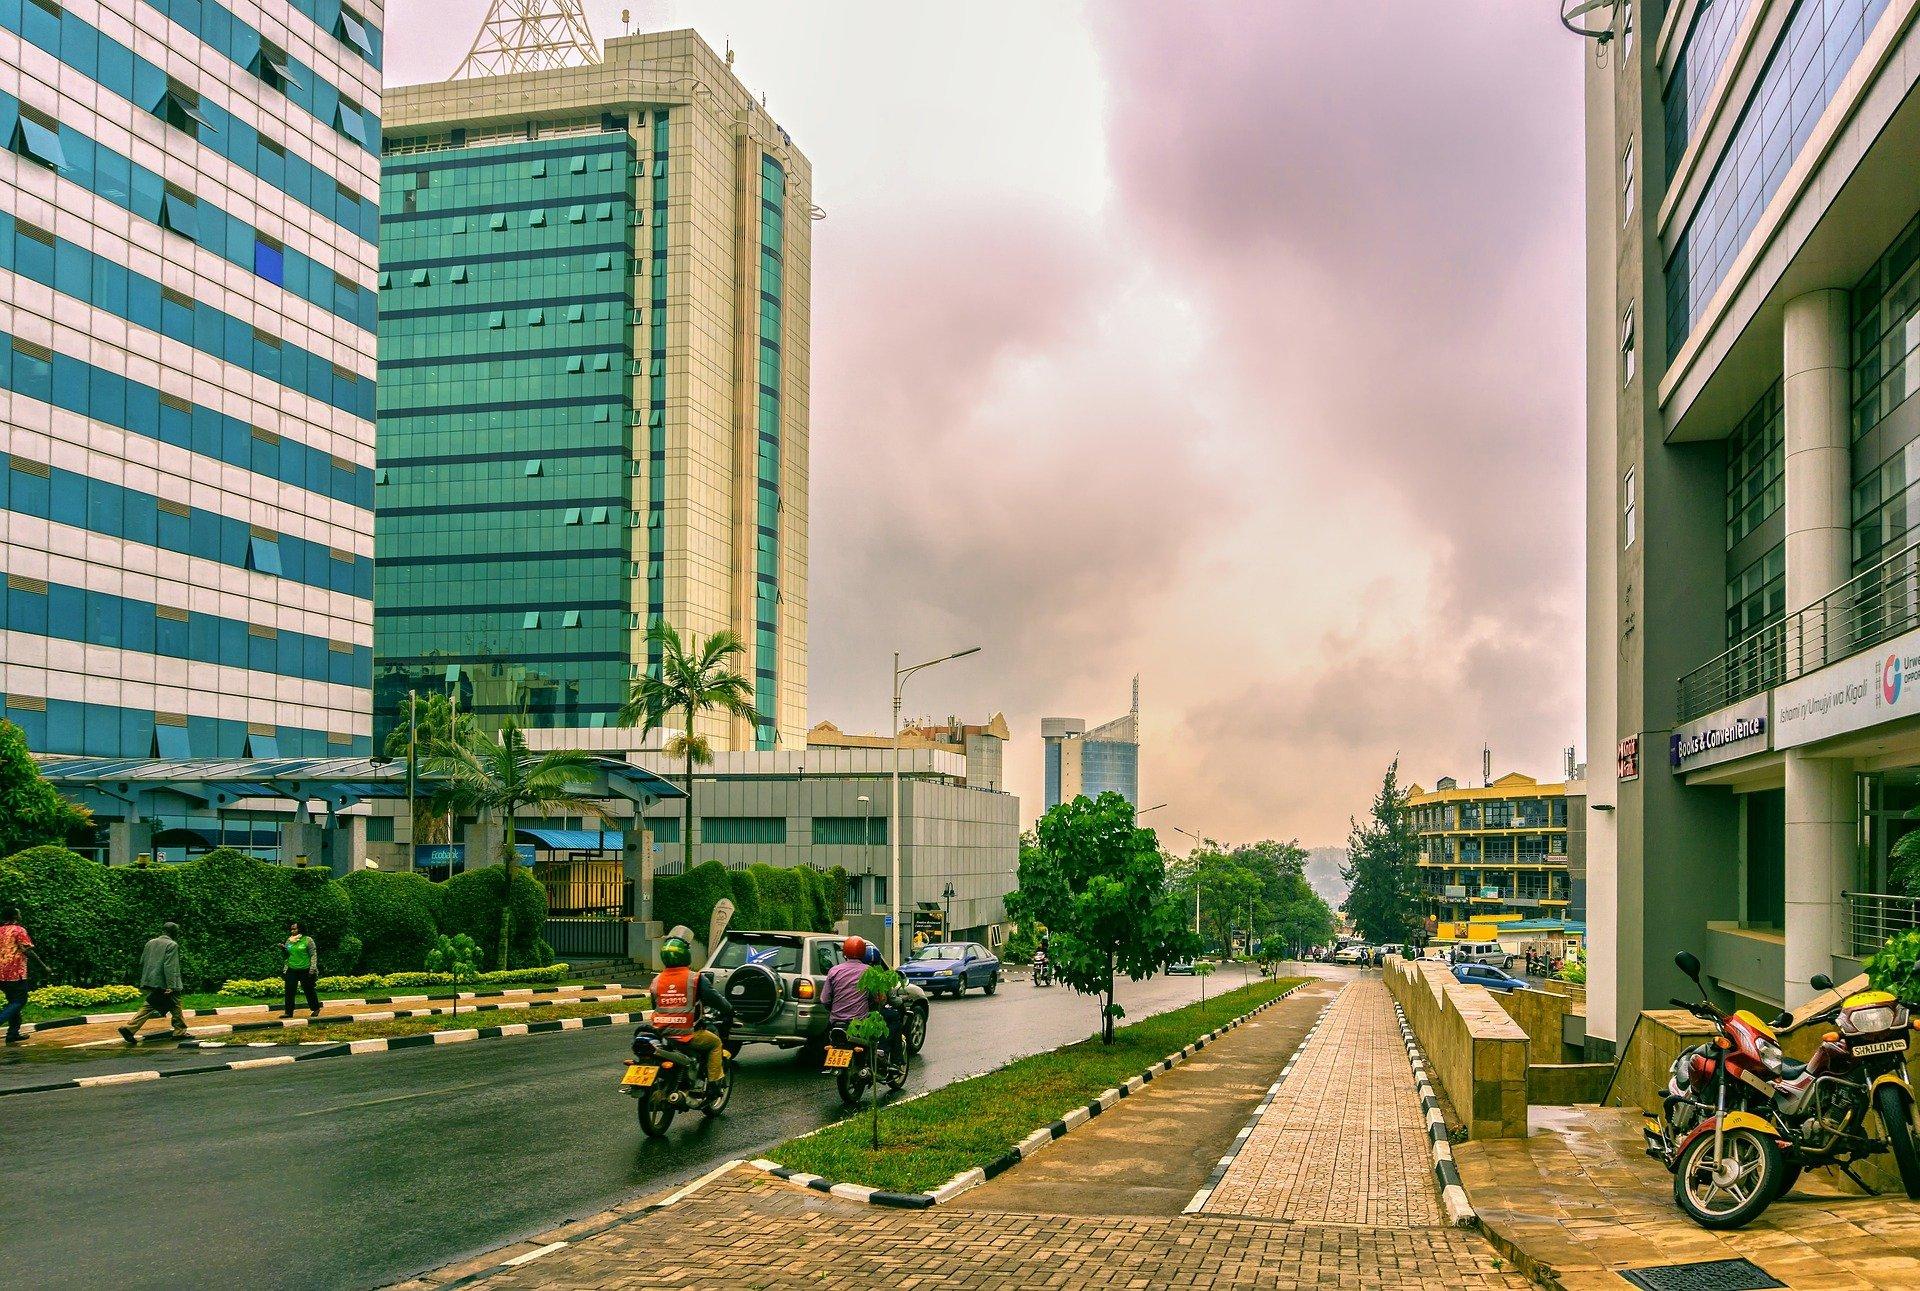 Kigali Downtown